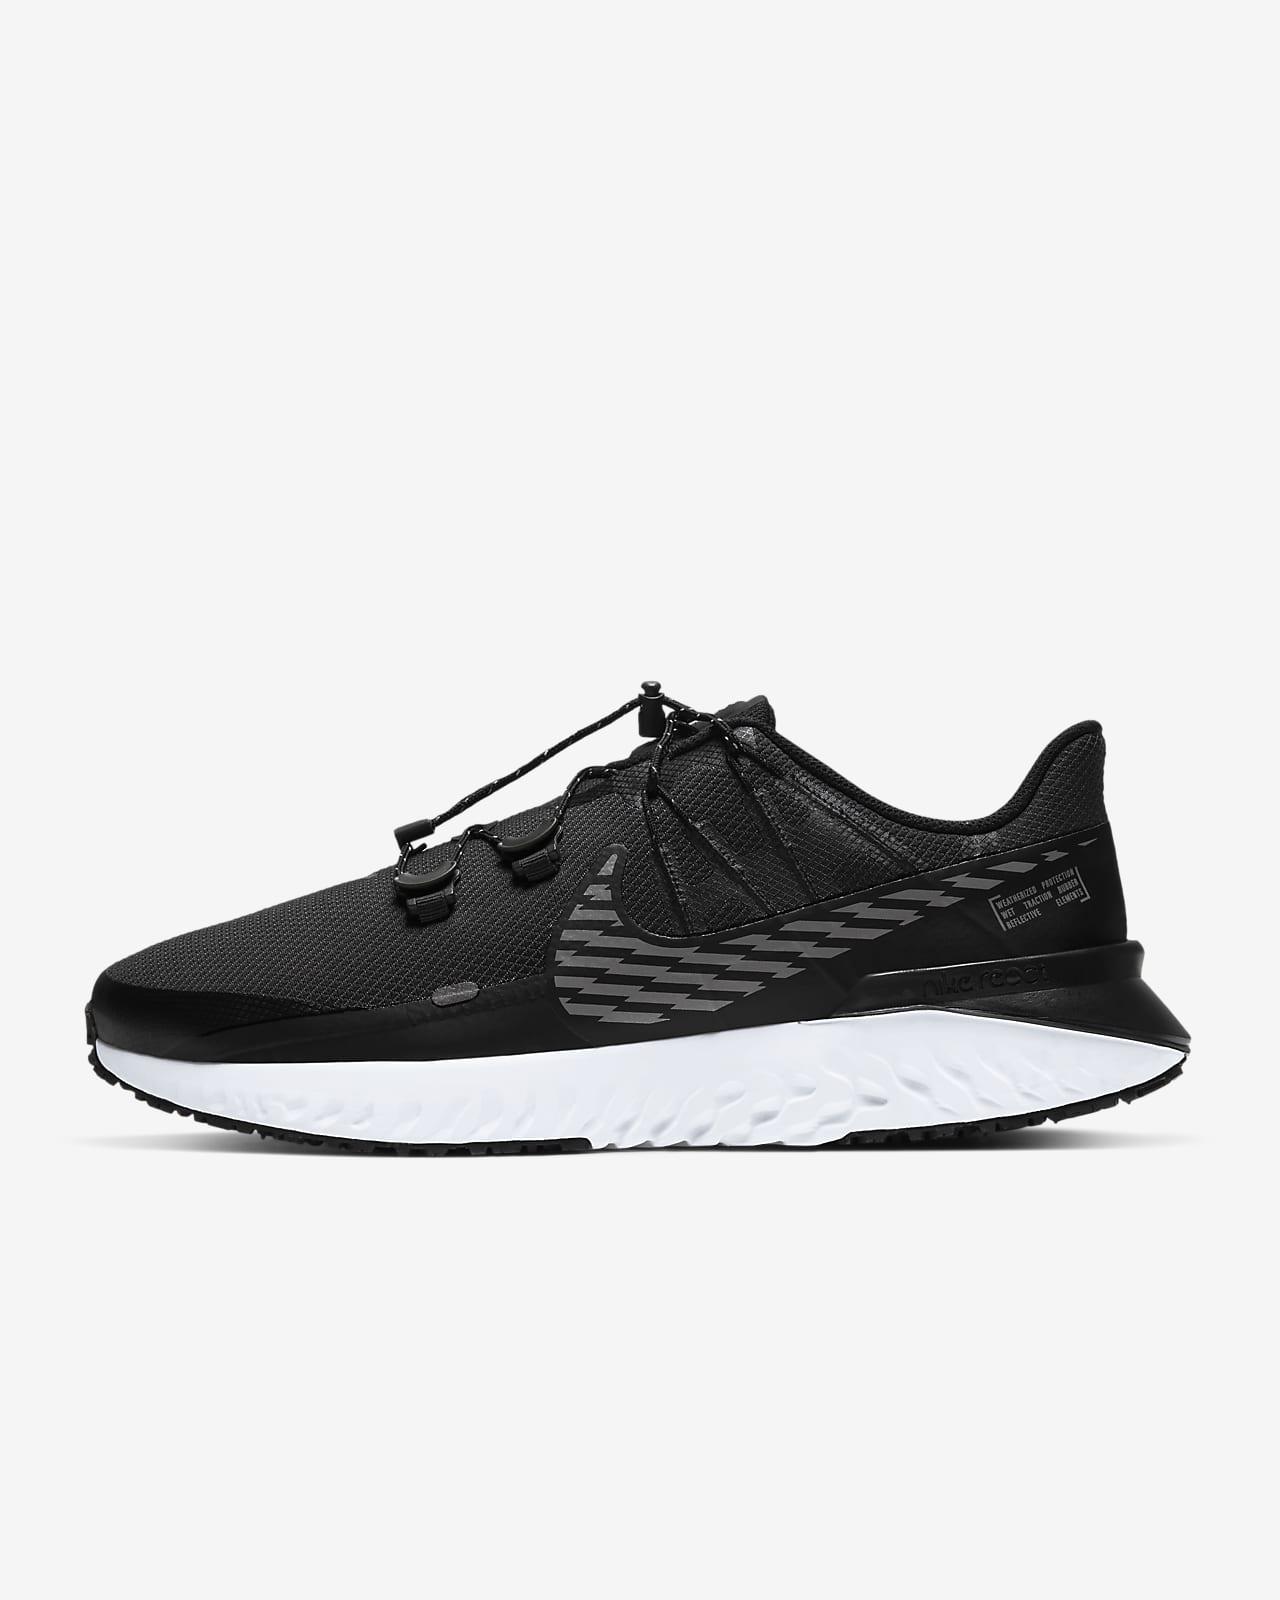 Pánská běžecká bota Nike Legend React 3 Shield